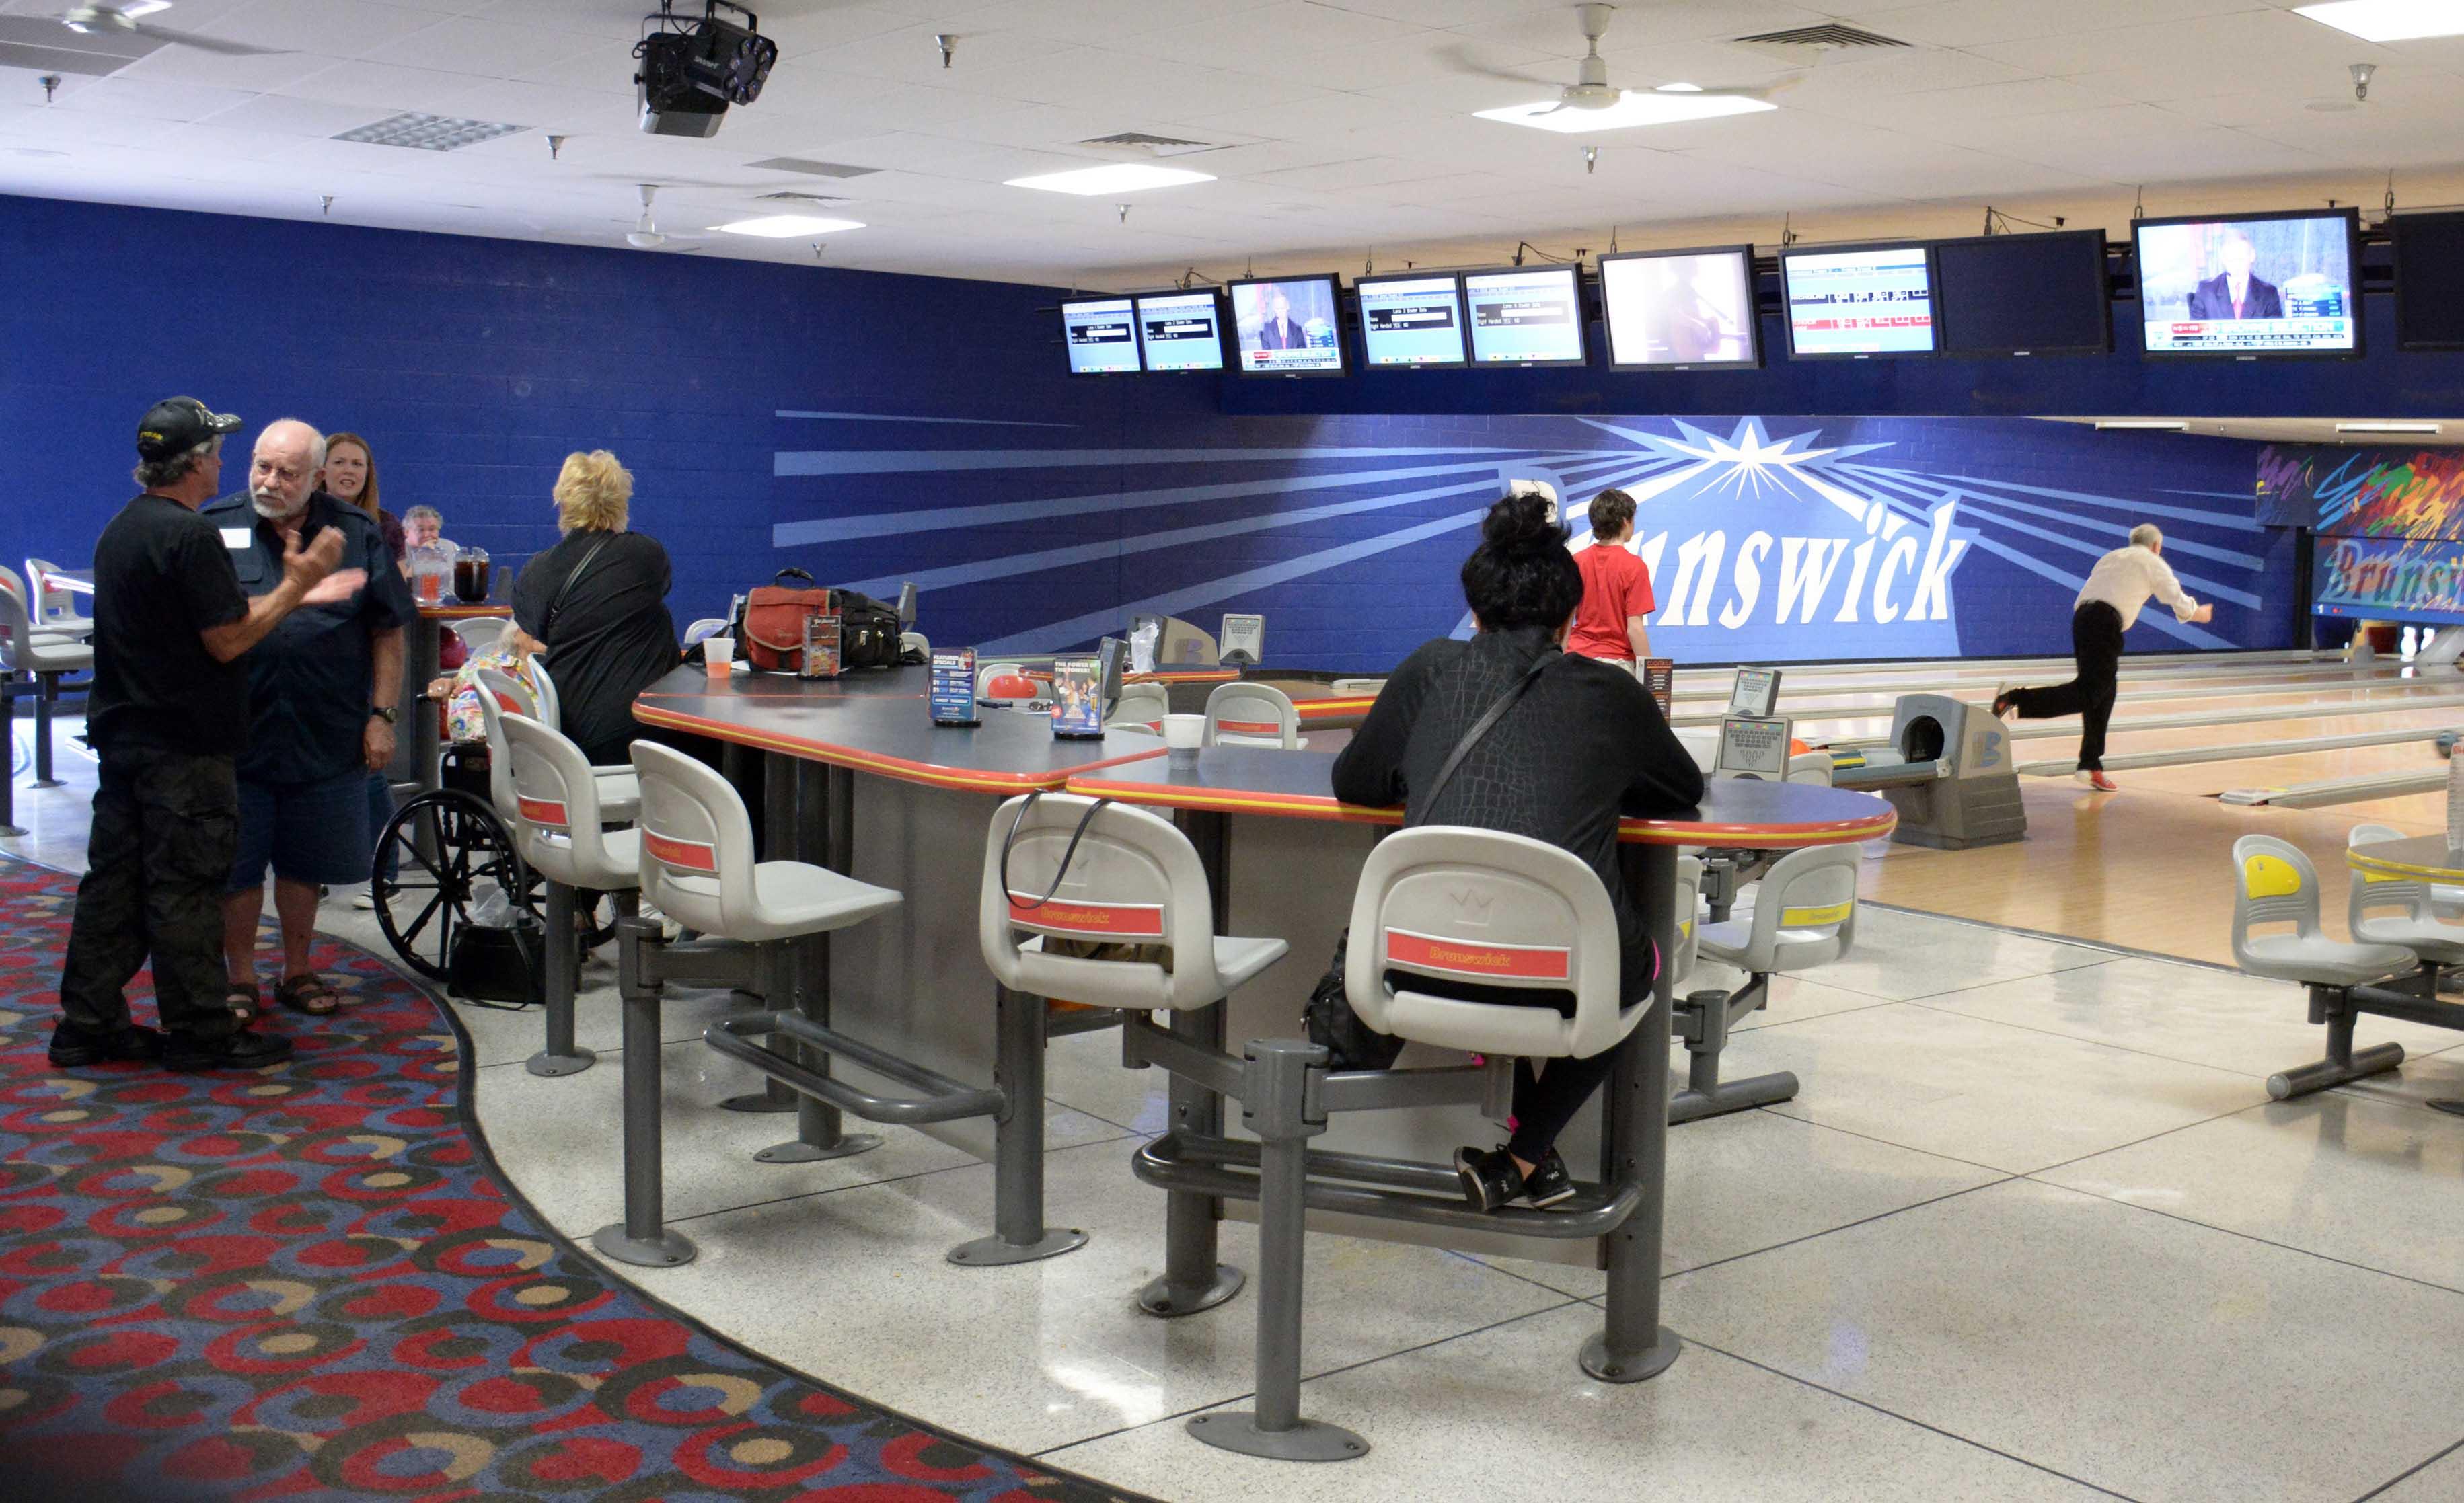 Members bowling